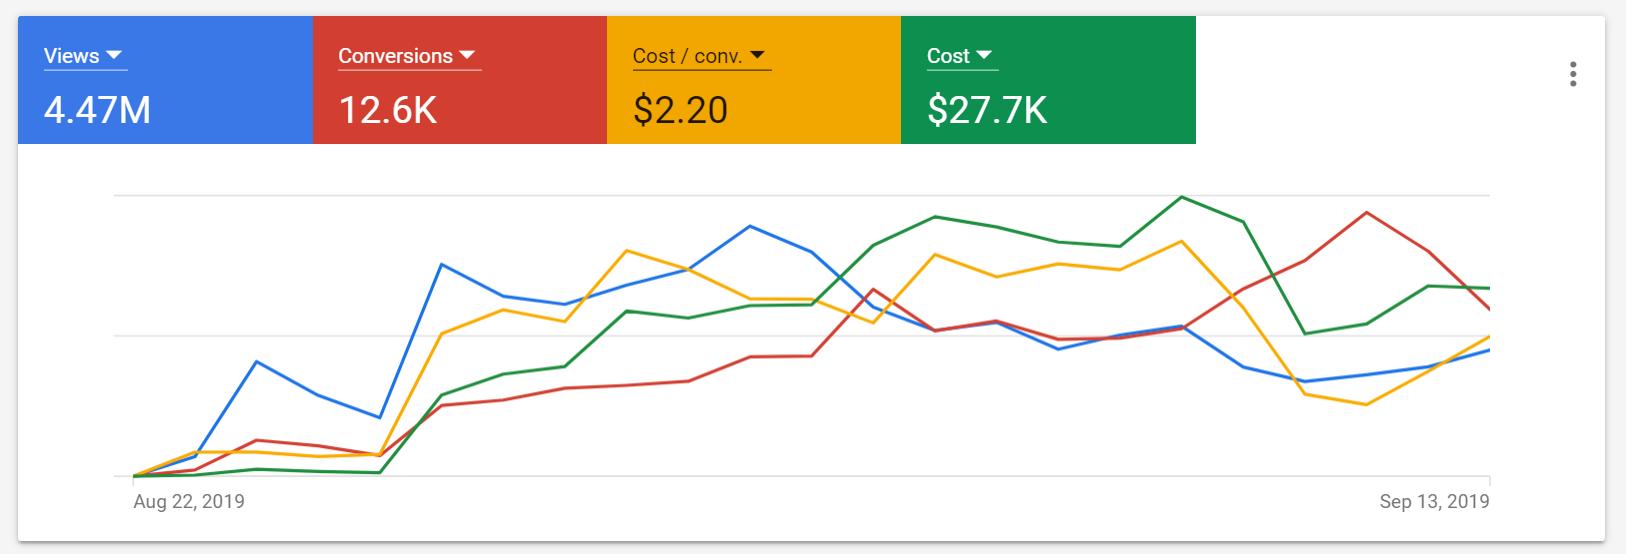 Google Ads (Aug 22 - Sept 13)